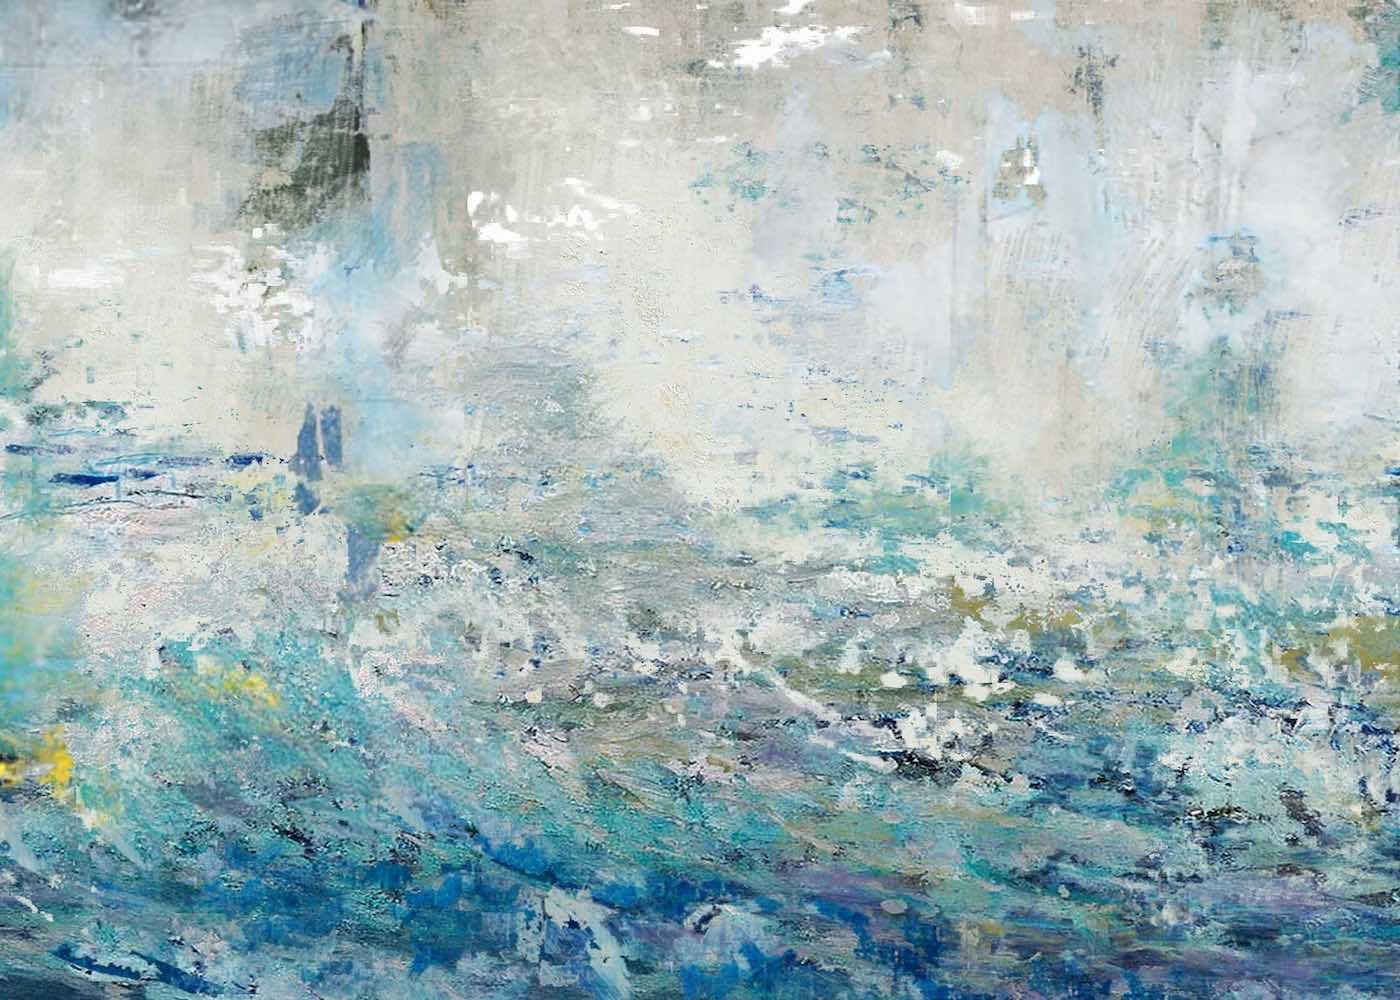 mazarin-ameublement-catalogue-produits-tableau-peinture-17